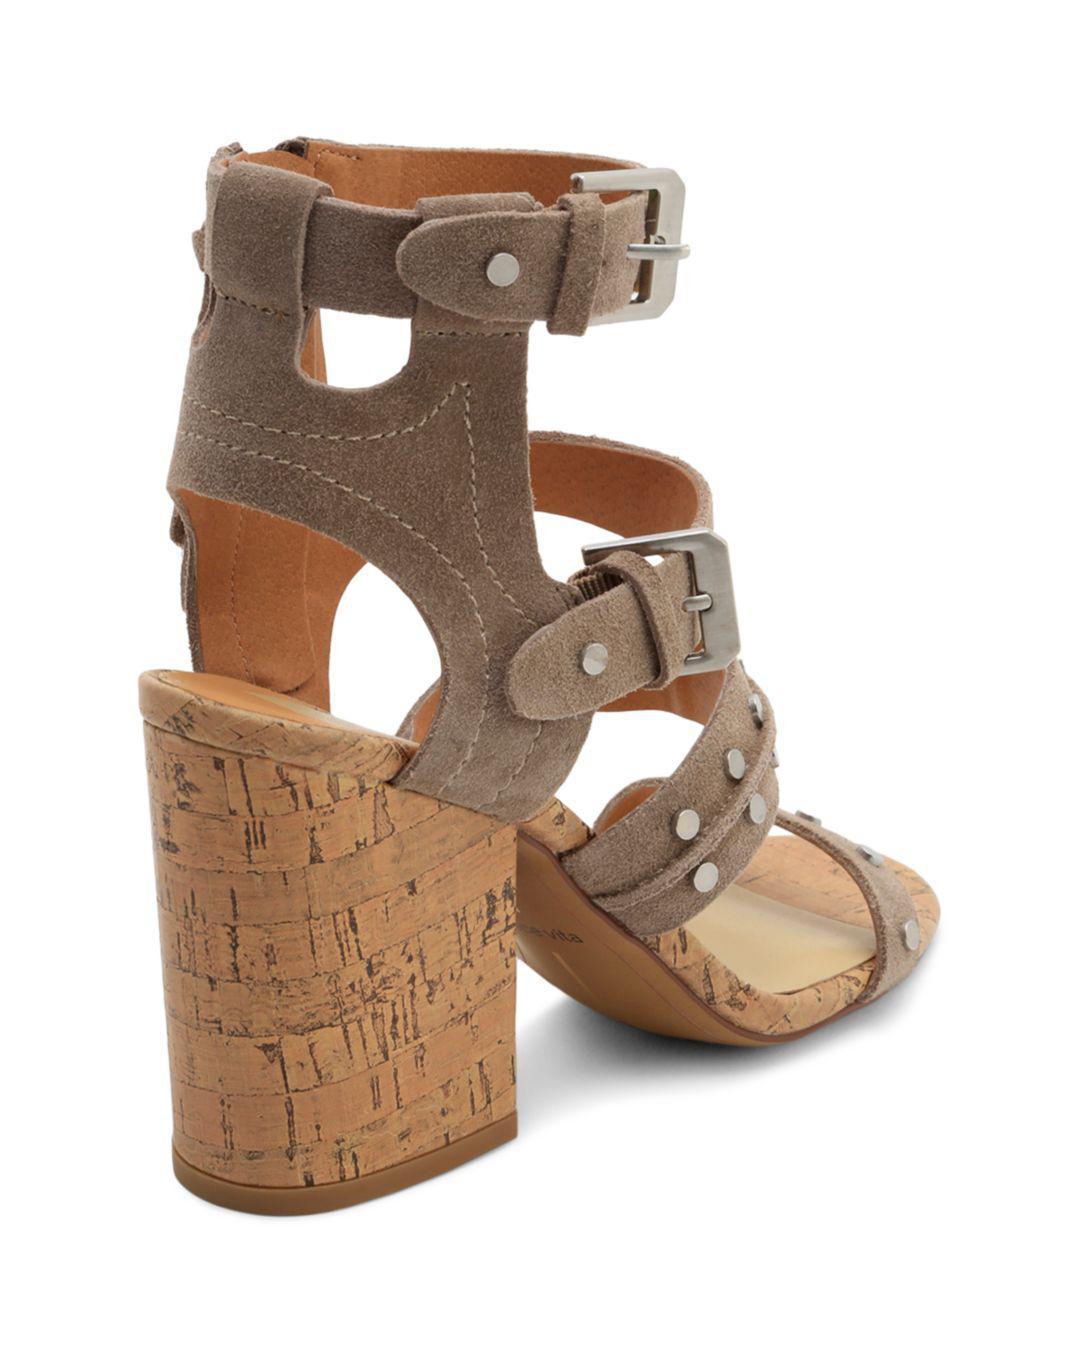 d09a240eacb Dolce Vita Women s Eddie Suede High Block Heel Gladiator Sandals in ...